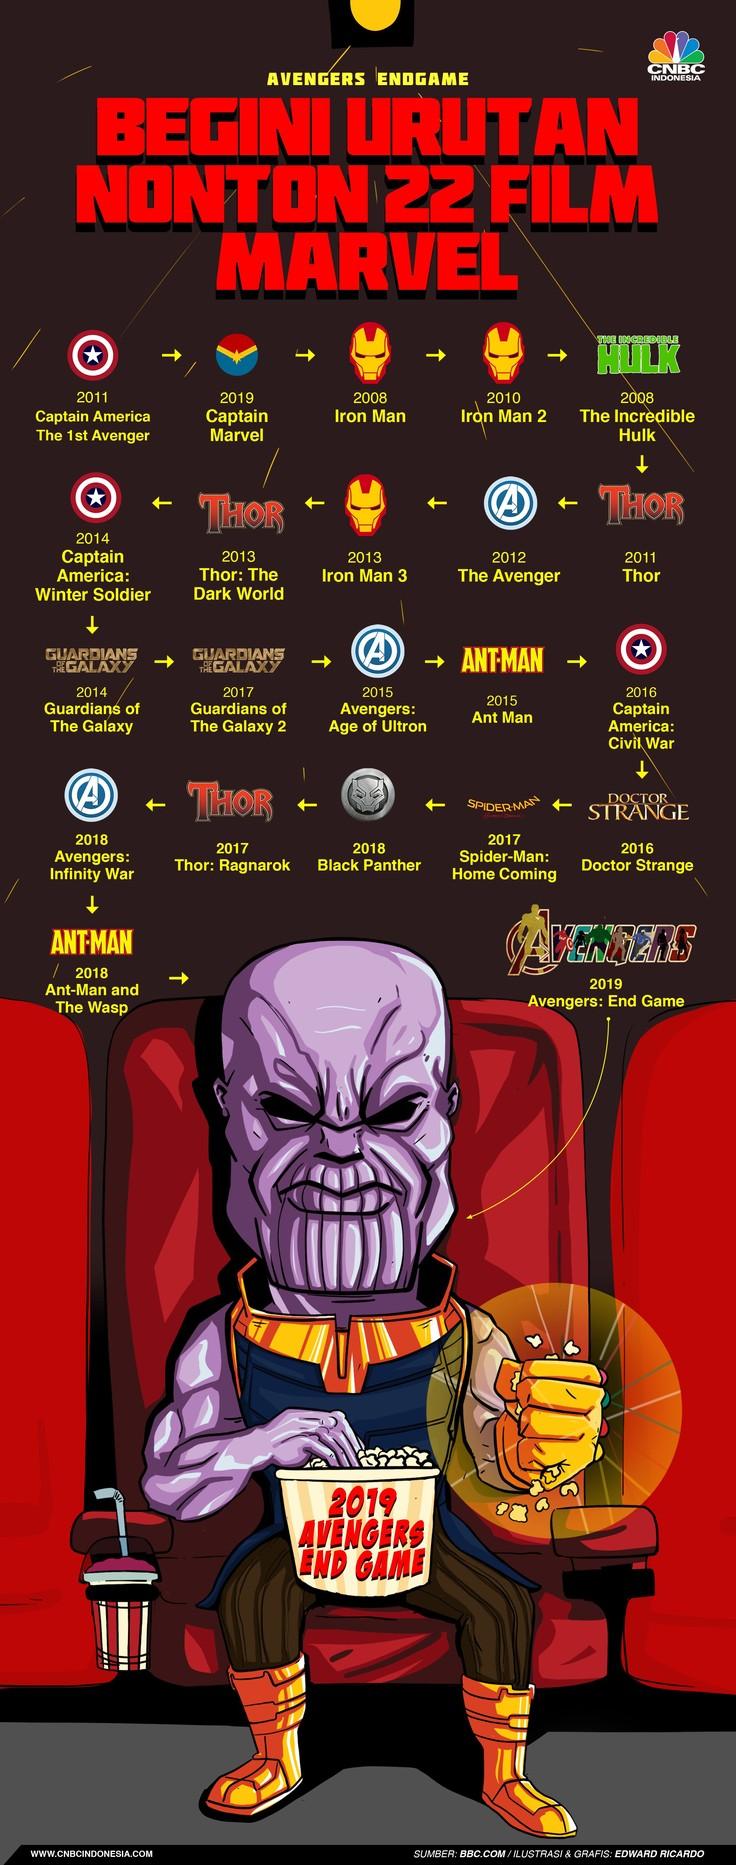 22 Film 11 Tahun, Ini Urutan Nonton Sebelum Avengers Endgame